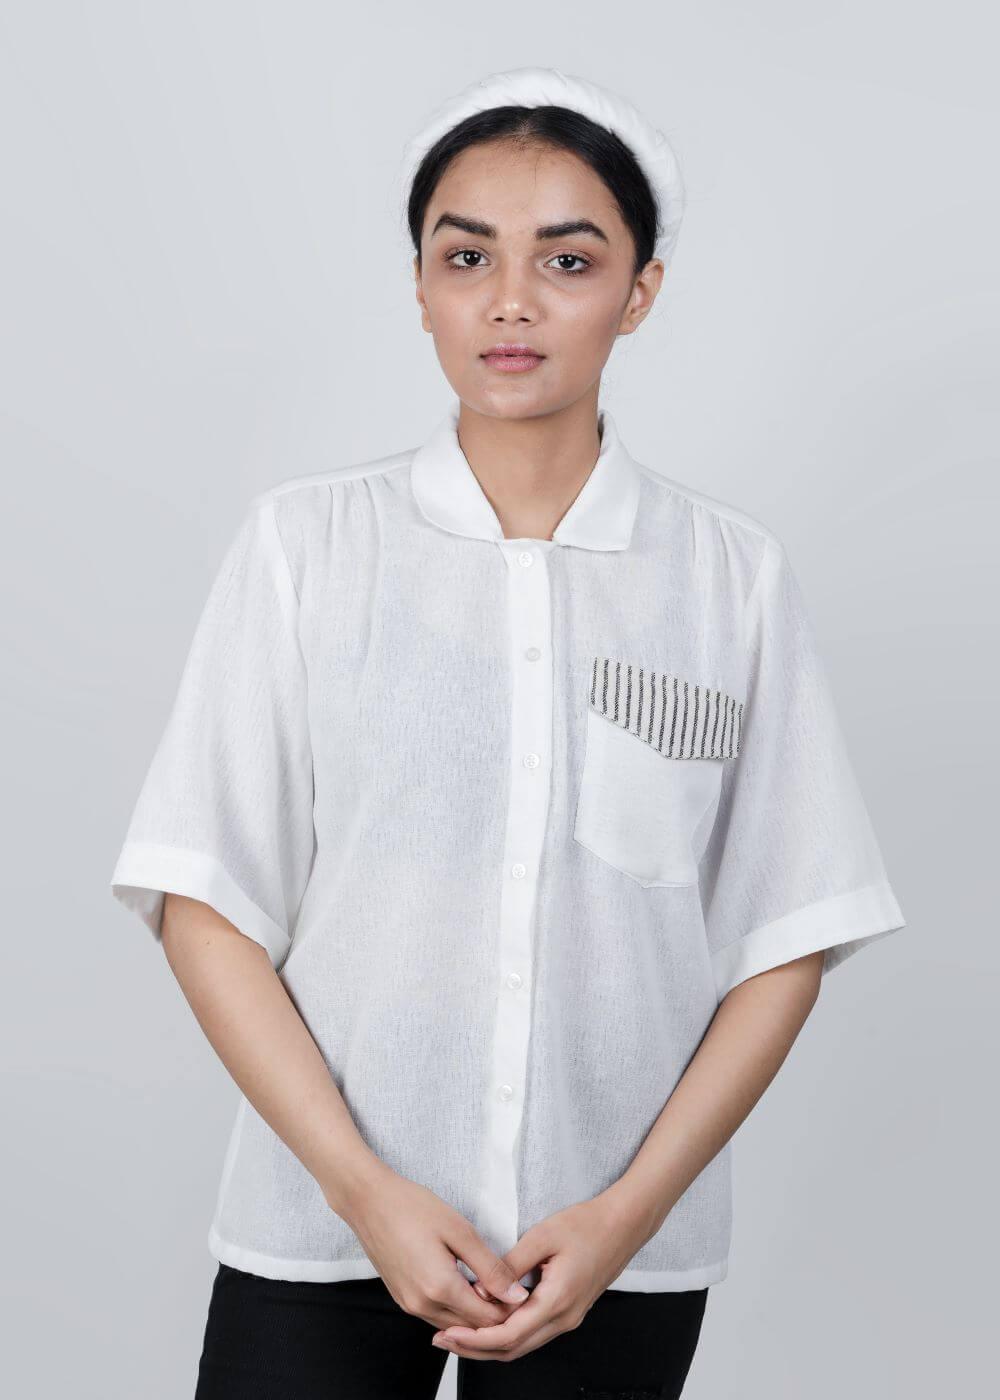 @STOREAT44 | Best Black&White Clothing Brand | 1